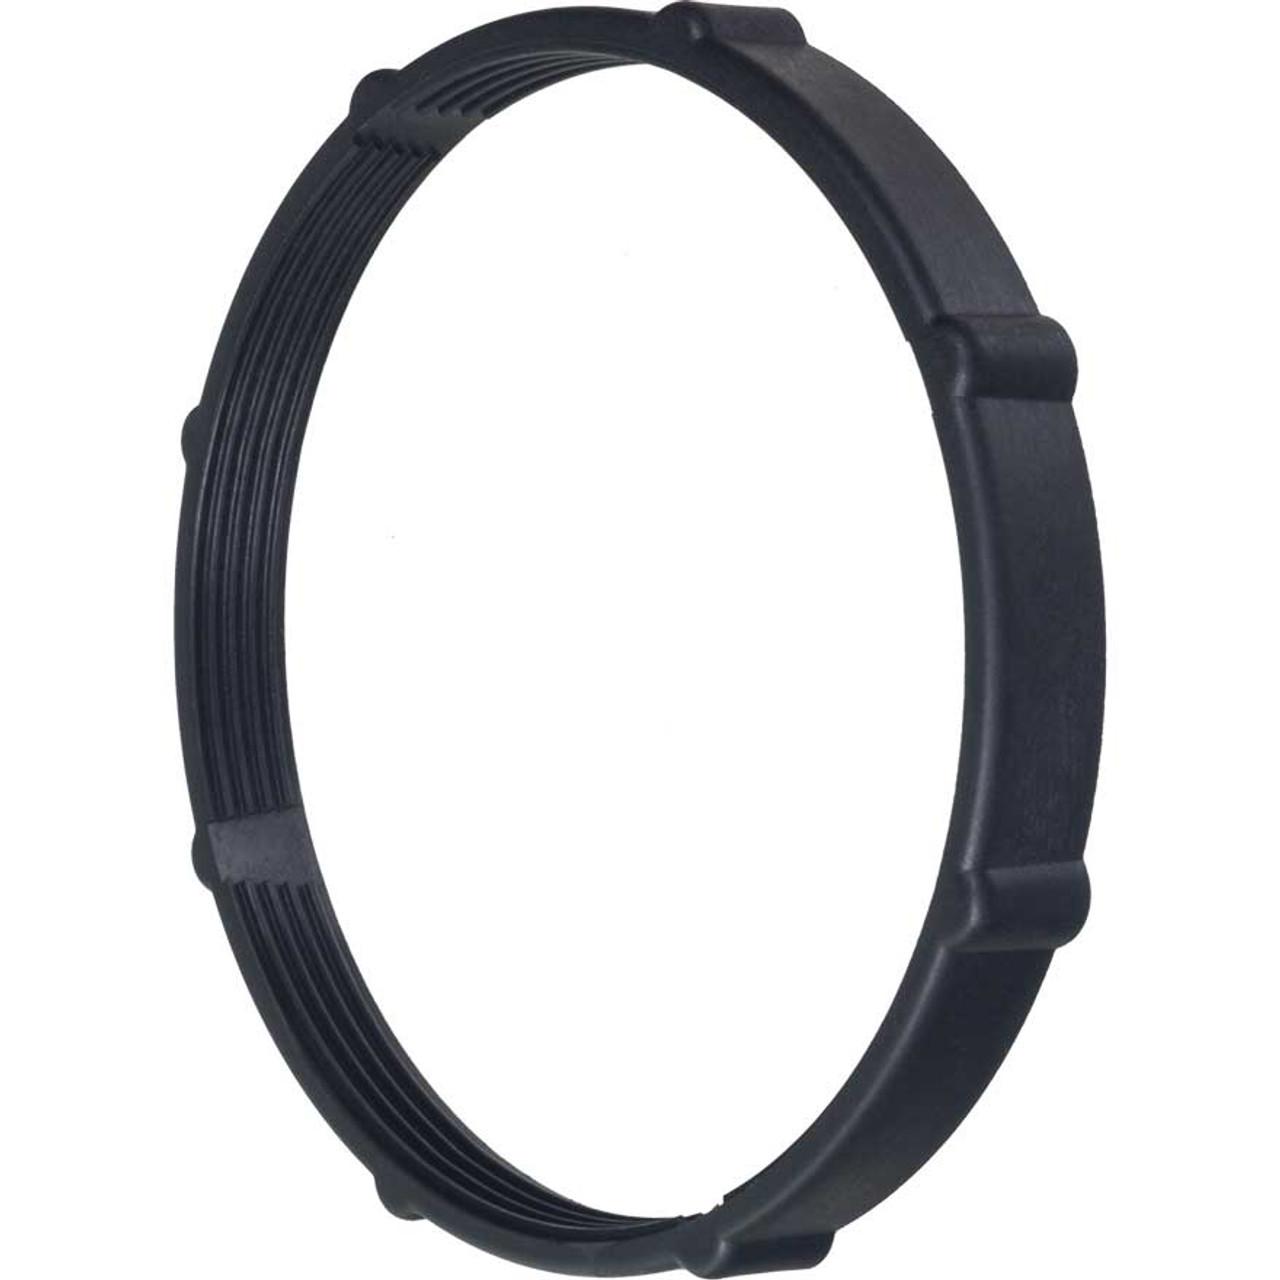 "Spin Lock Ring for 4 1/2"" Gauges"